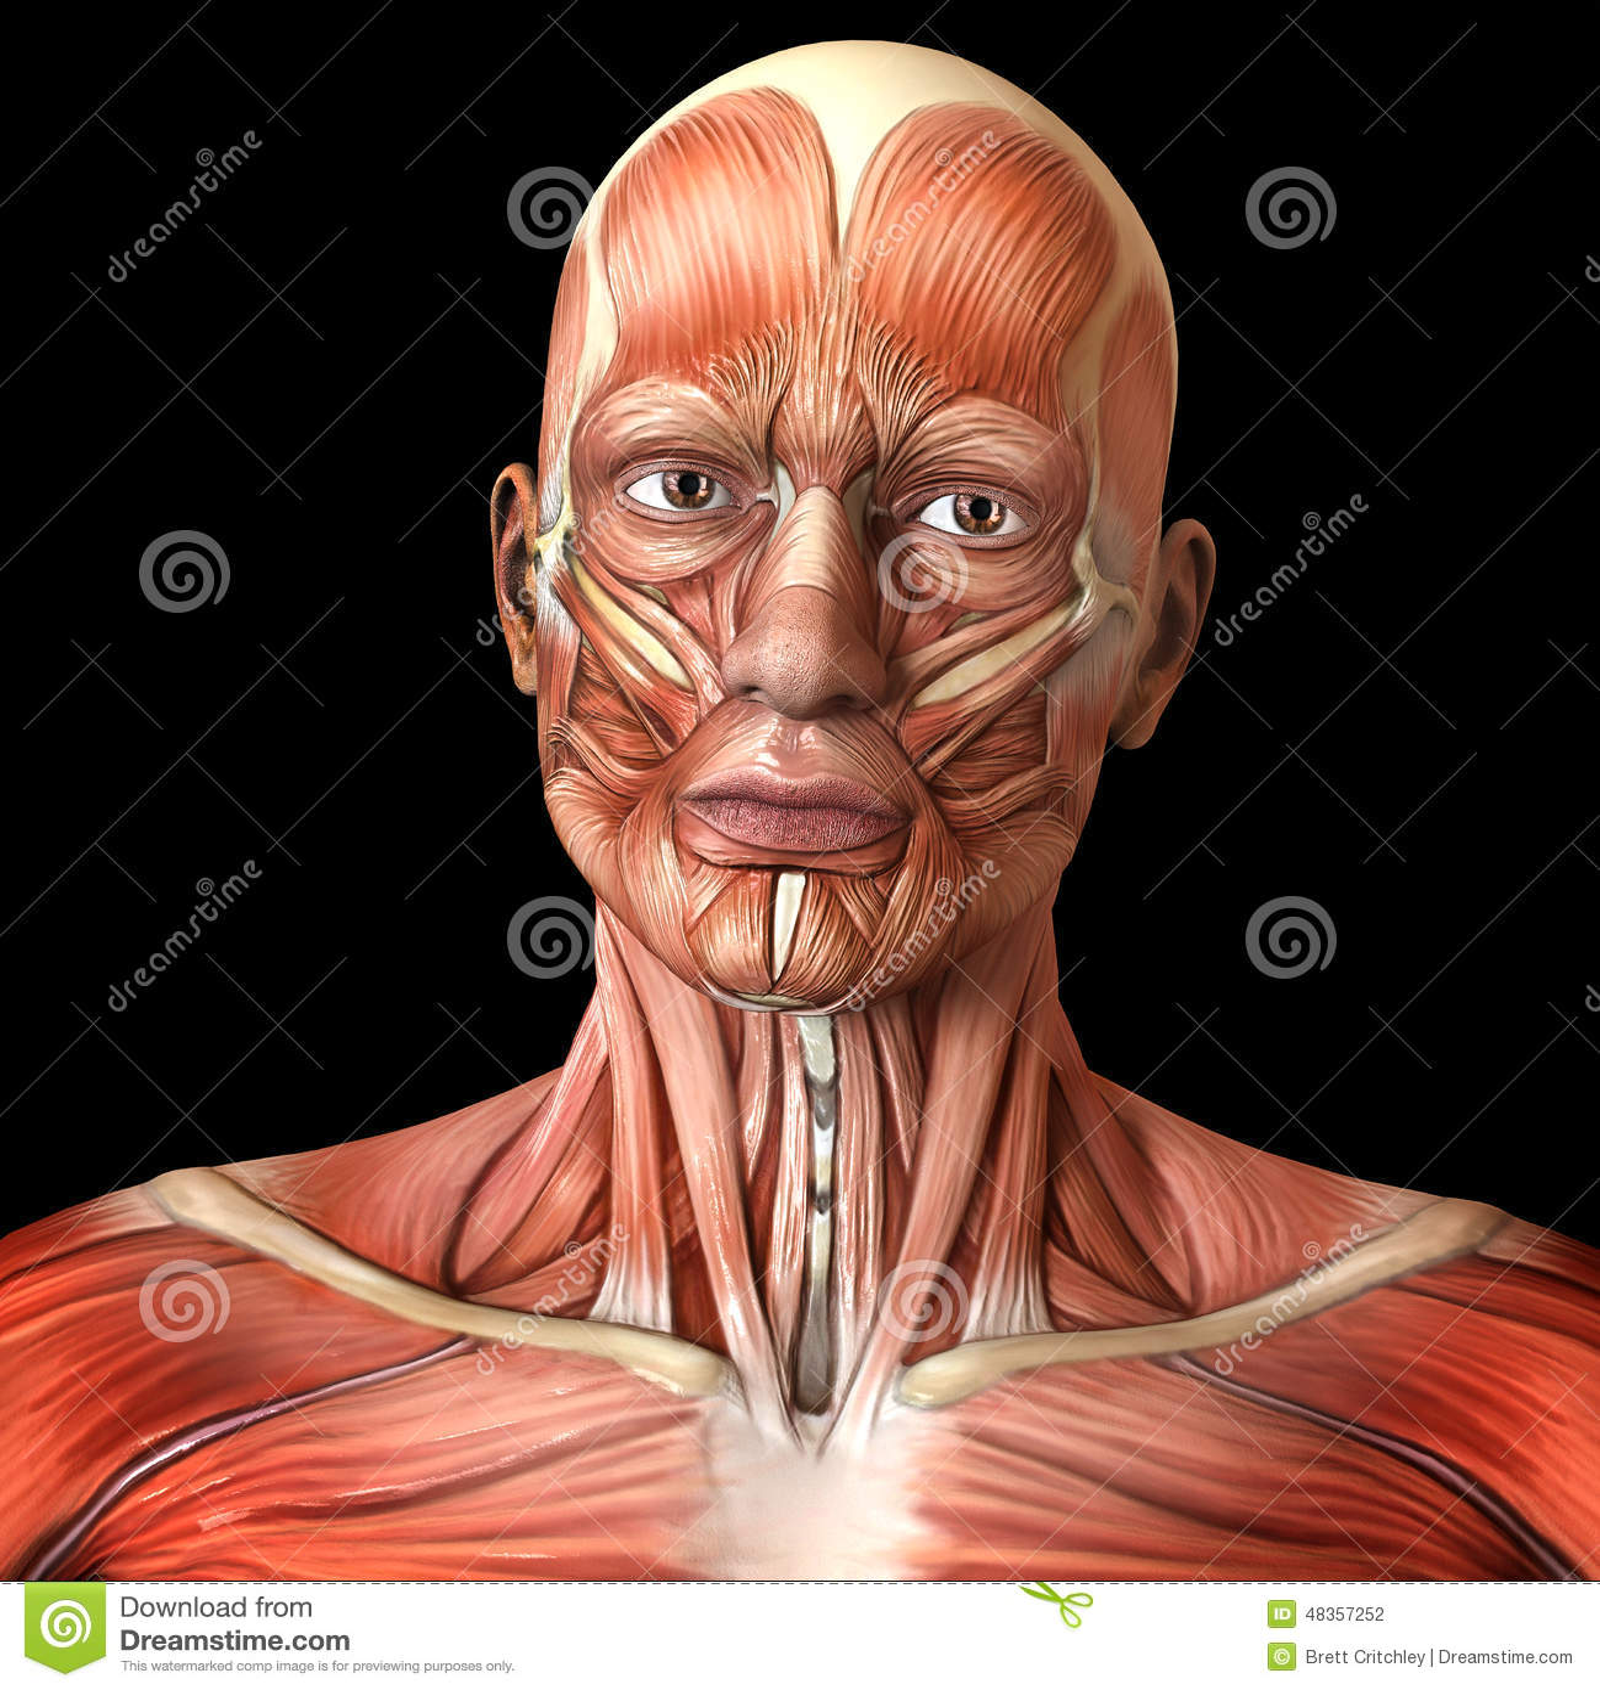 Human Muscle Anatomy Face